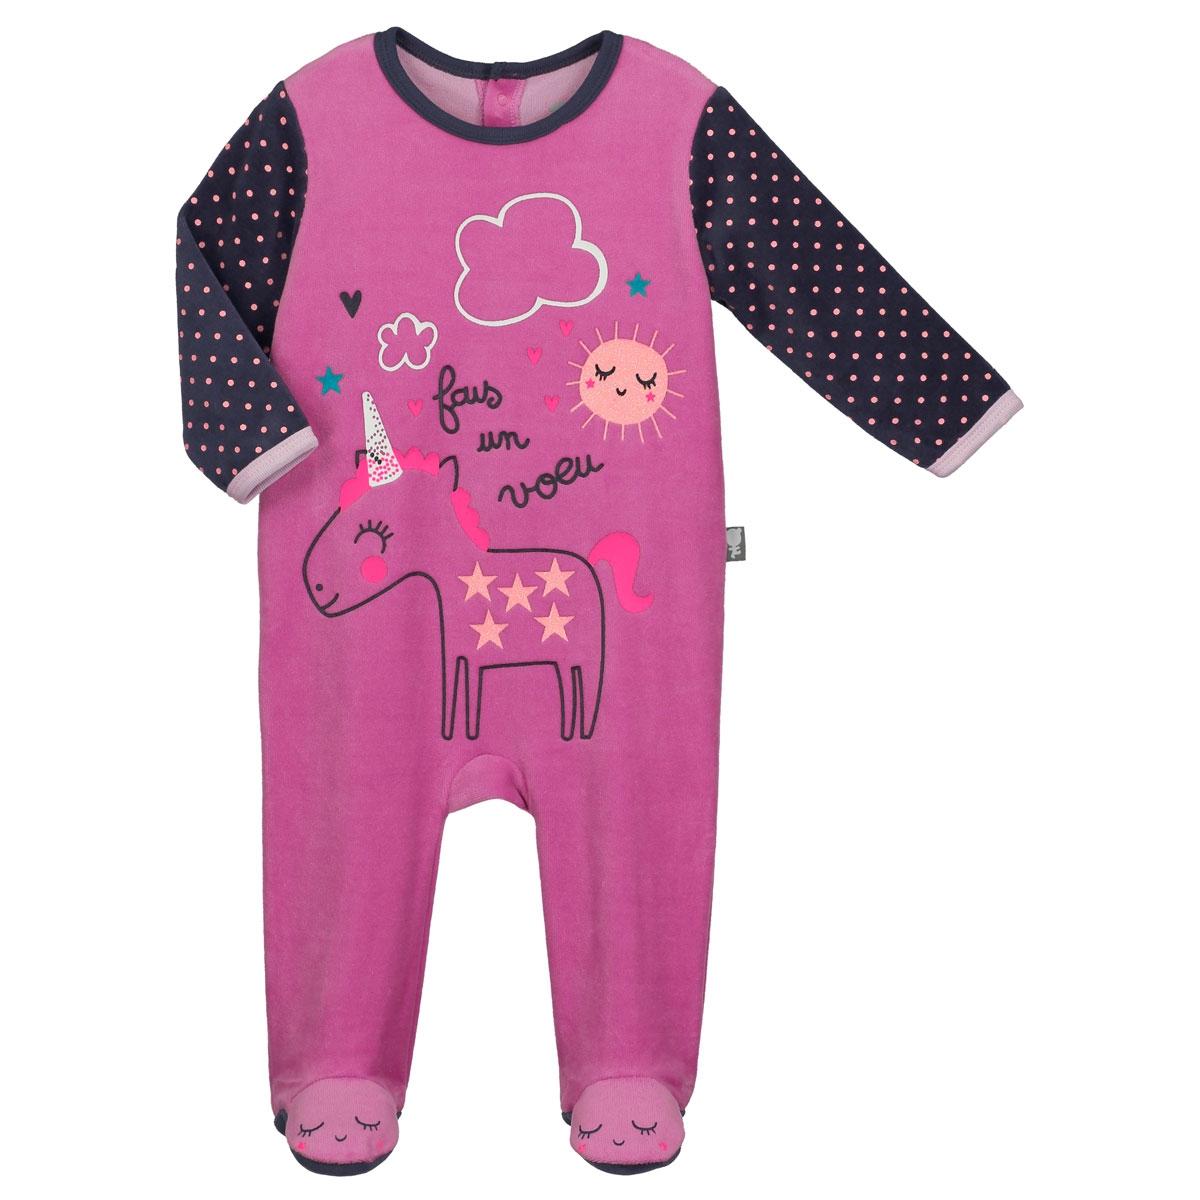 4cd33bf2ebd91 Pyjama bébé velours Licorne - PETIT BEGUIN